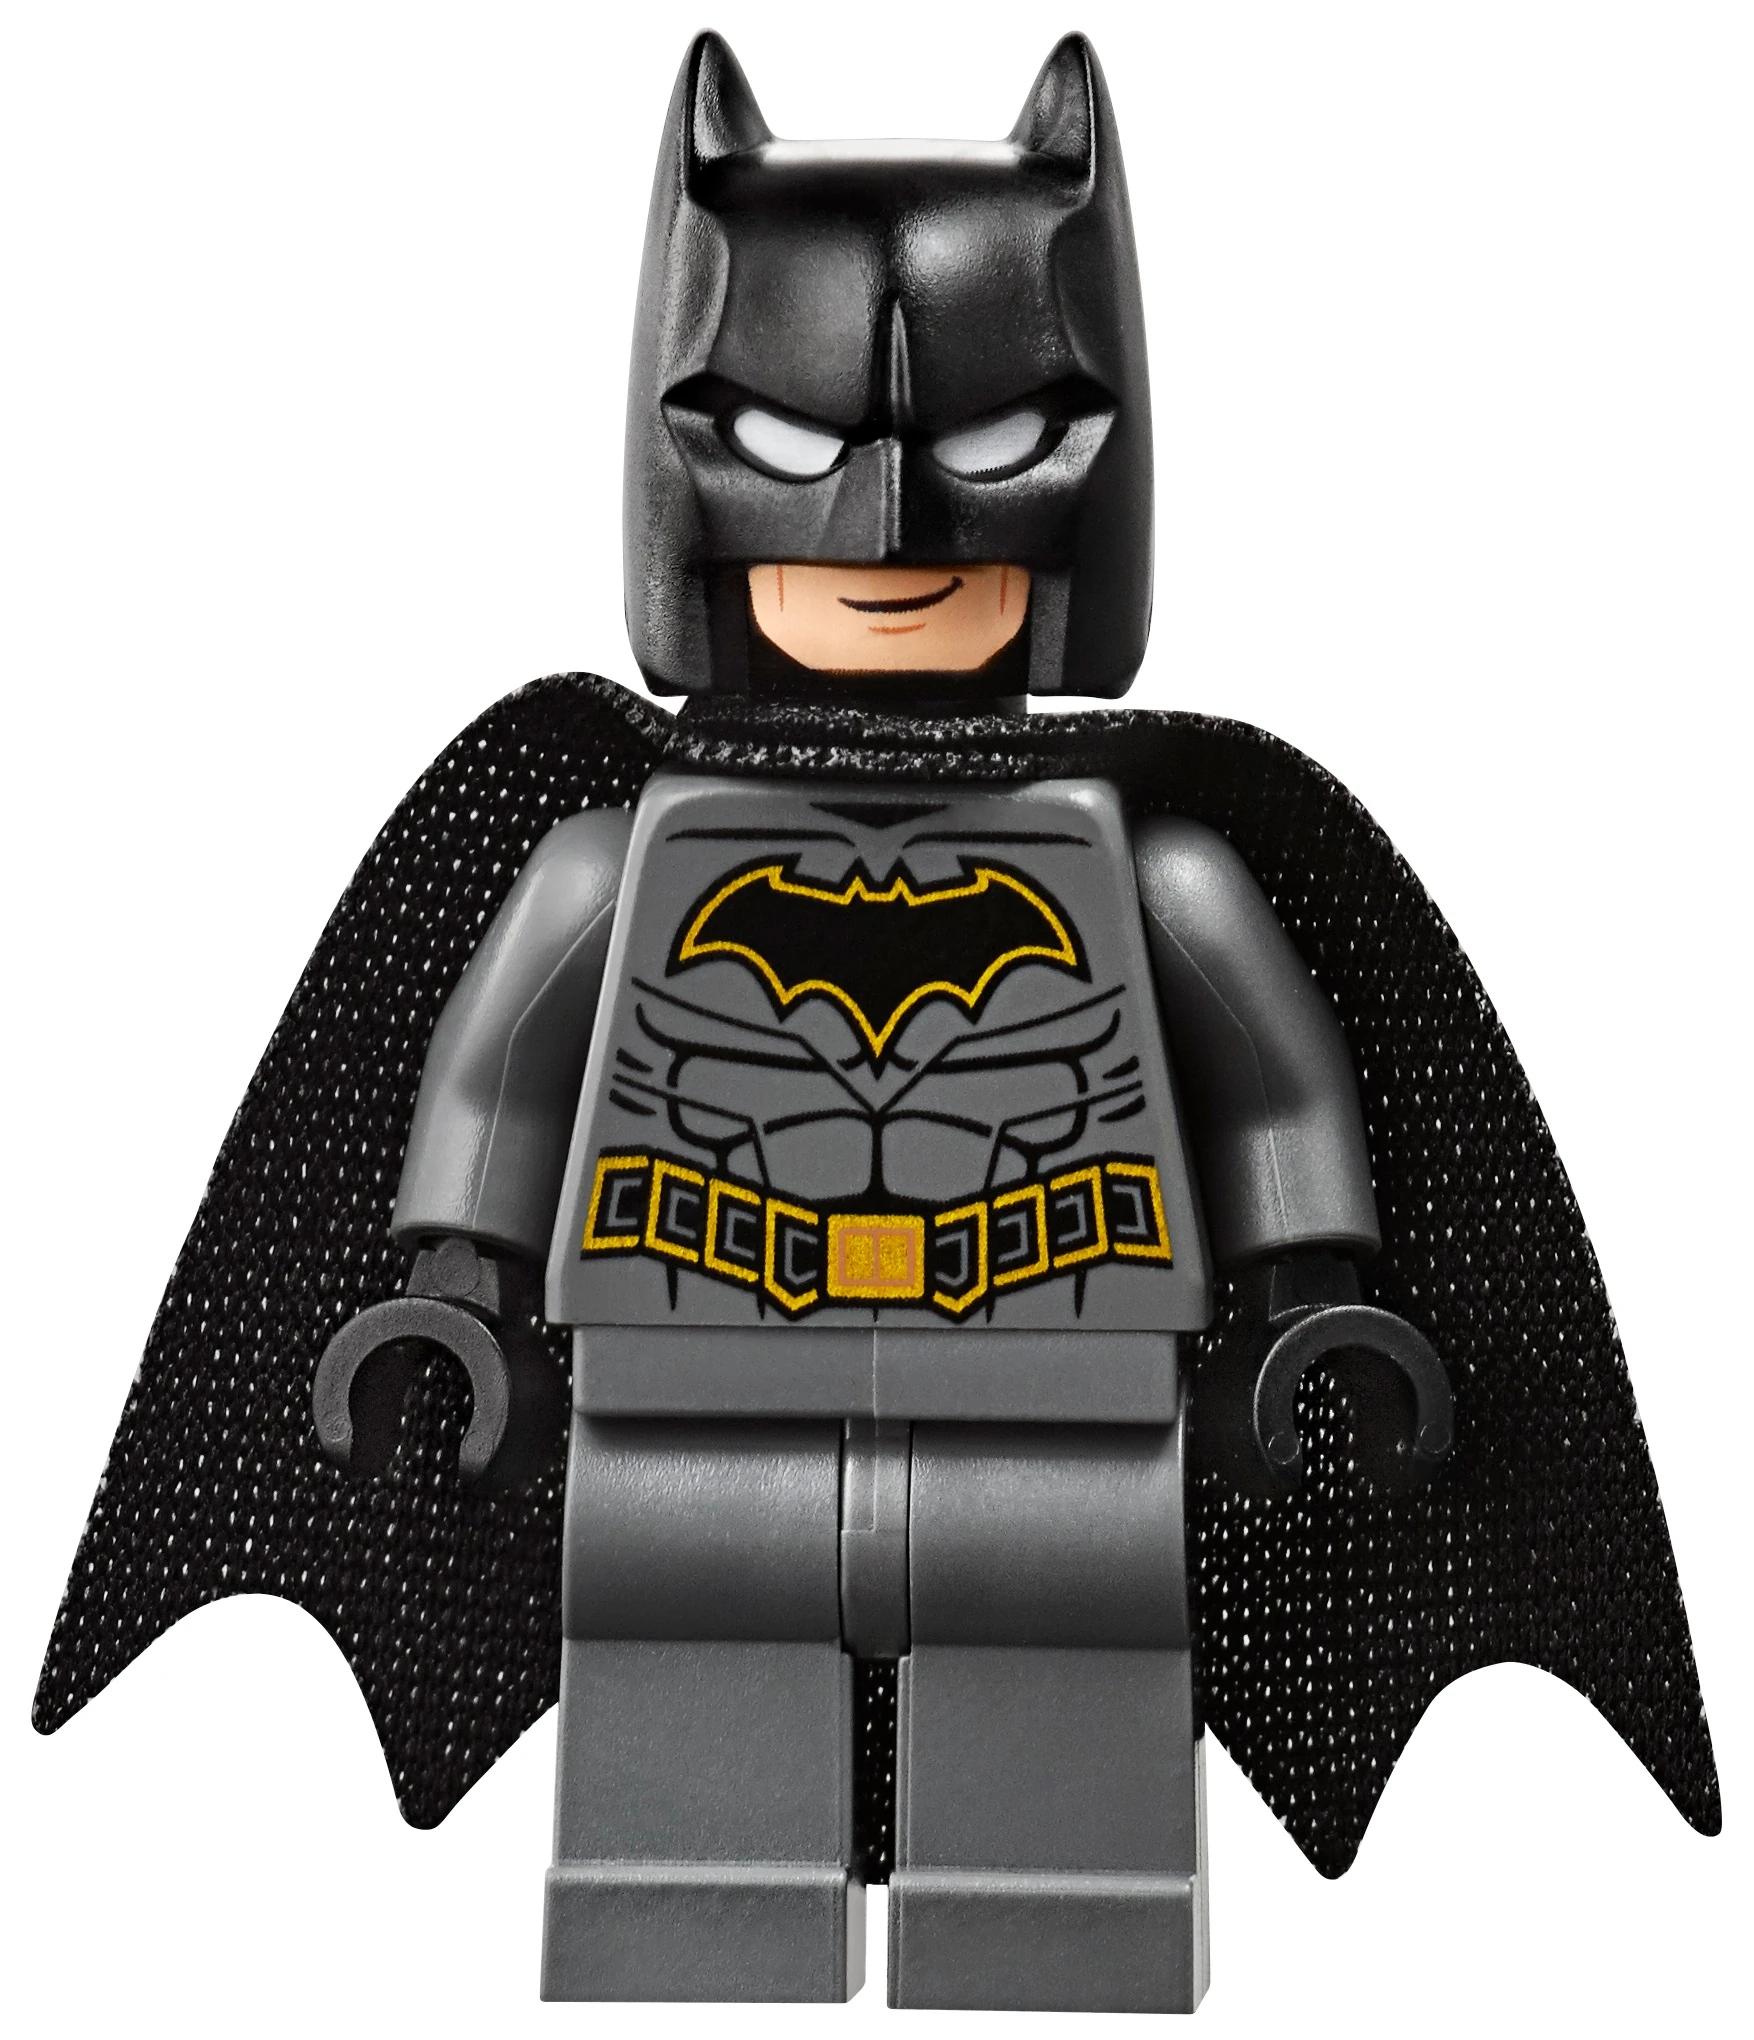 Batman (Minifigure)   Brickipedia   FANDOM powered by Wikia